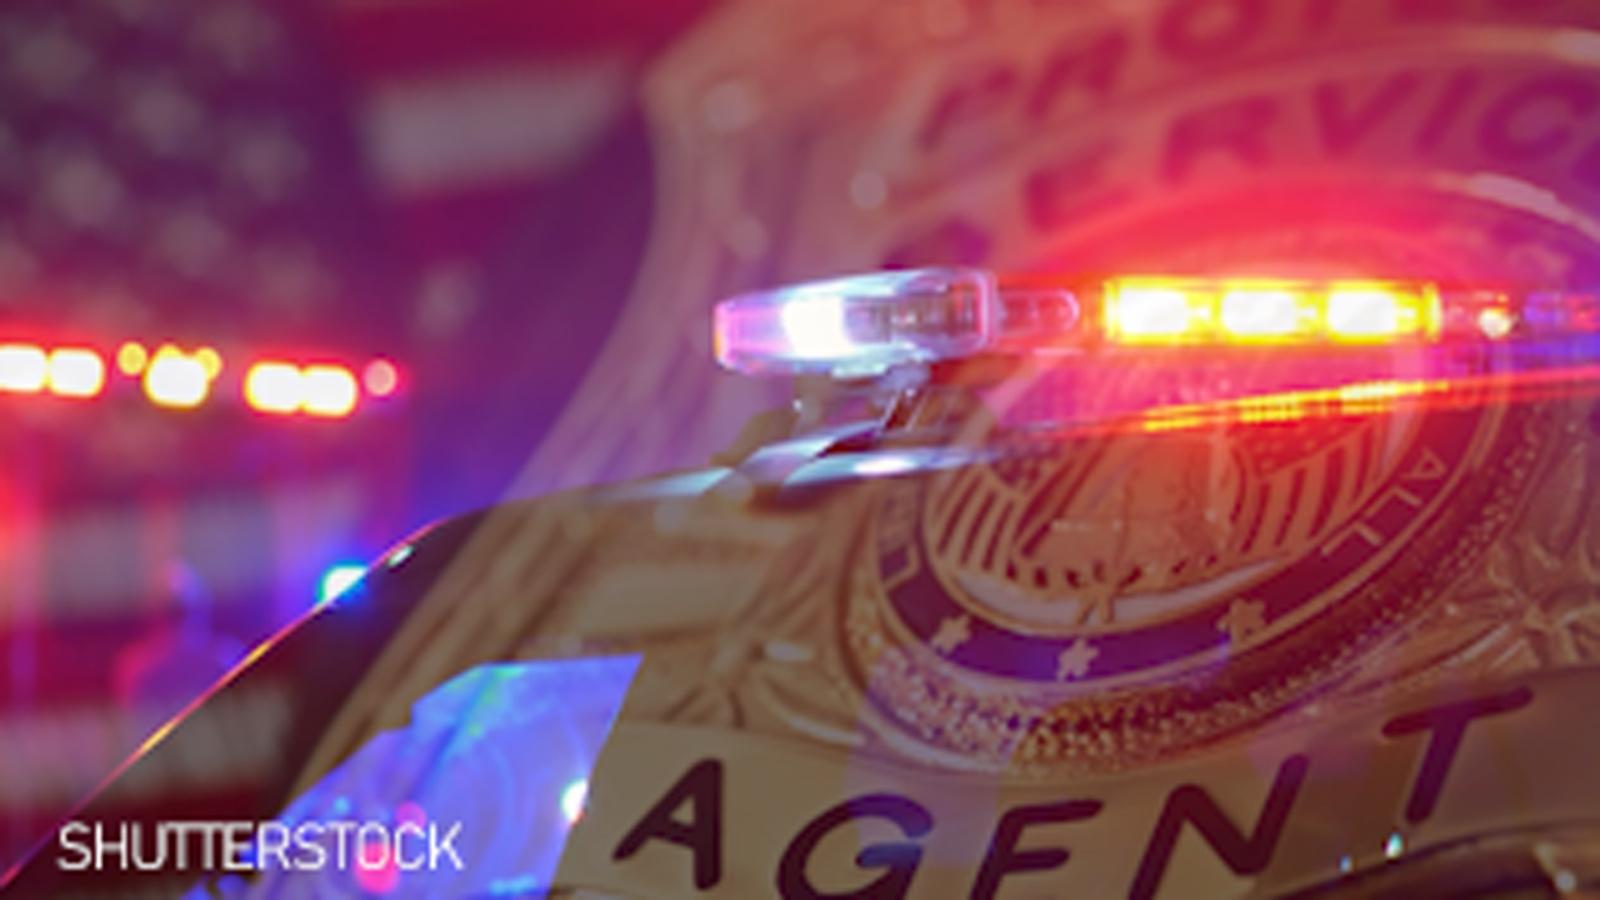 HPD officer has been shot in east Houston, suspect not in custody: officials